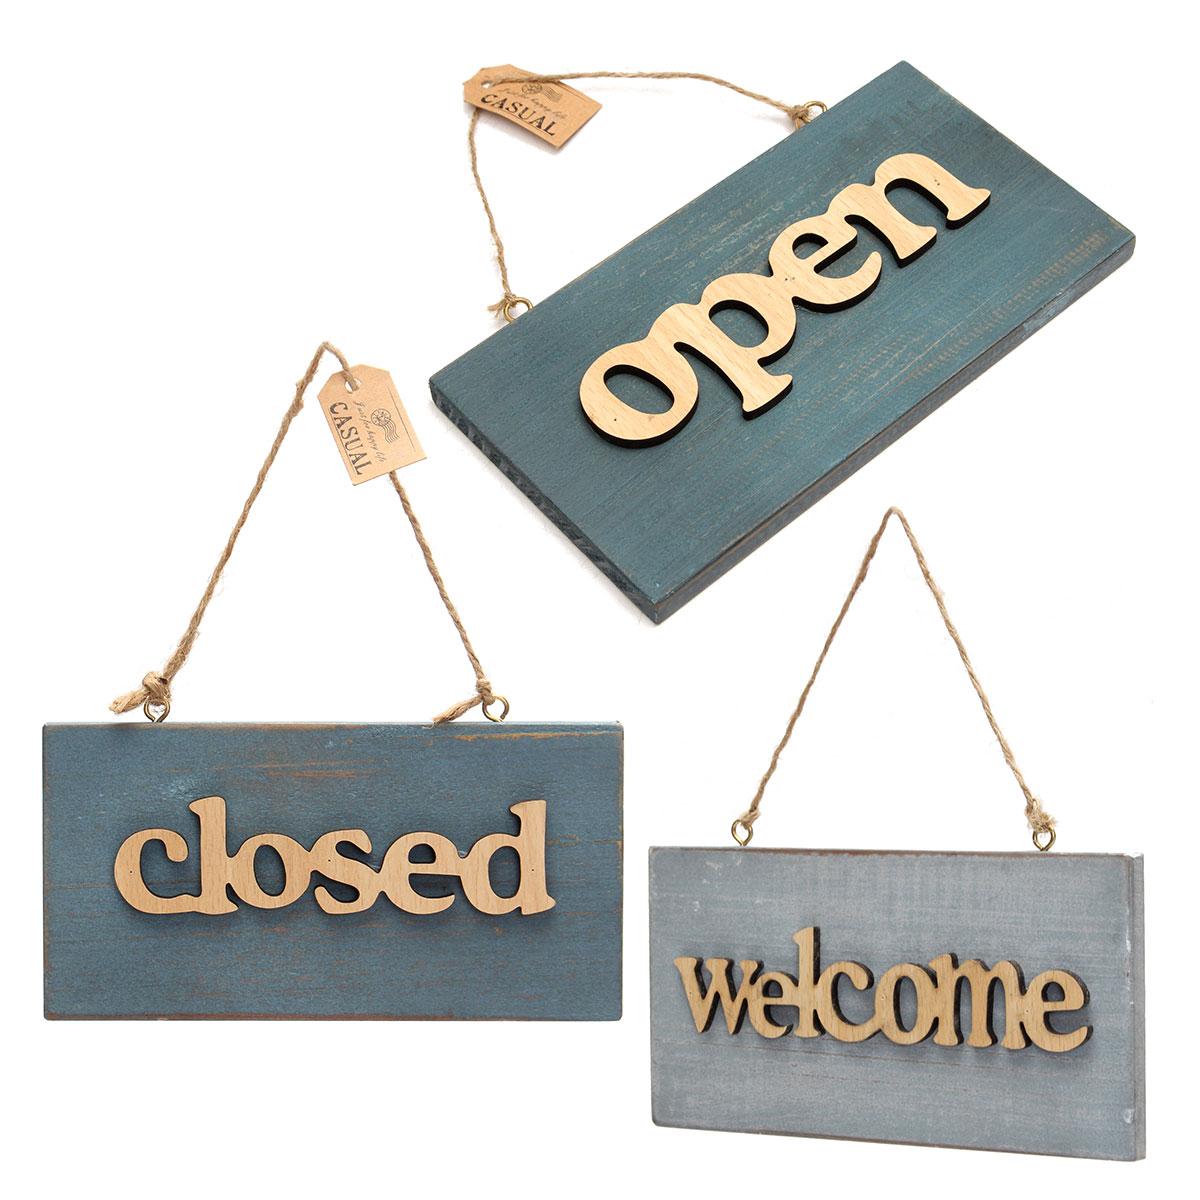 Vintage Blue Wood Poster Wooden Open Closed Welcome Sign Plaque for Home Cafe Shop Door Hanging Sign Hanging Decoration Crafts